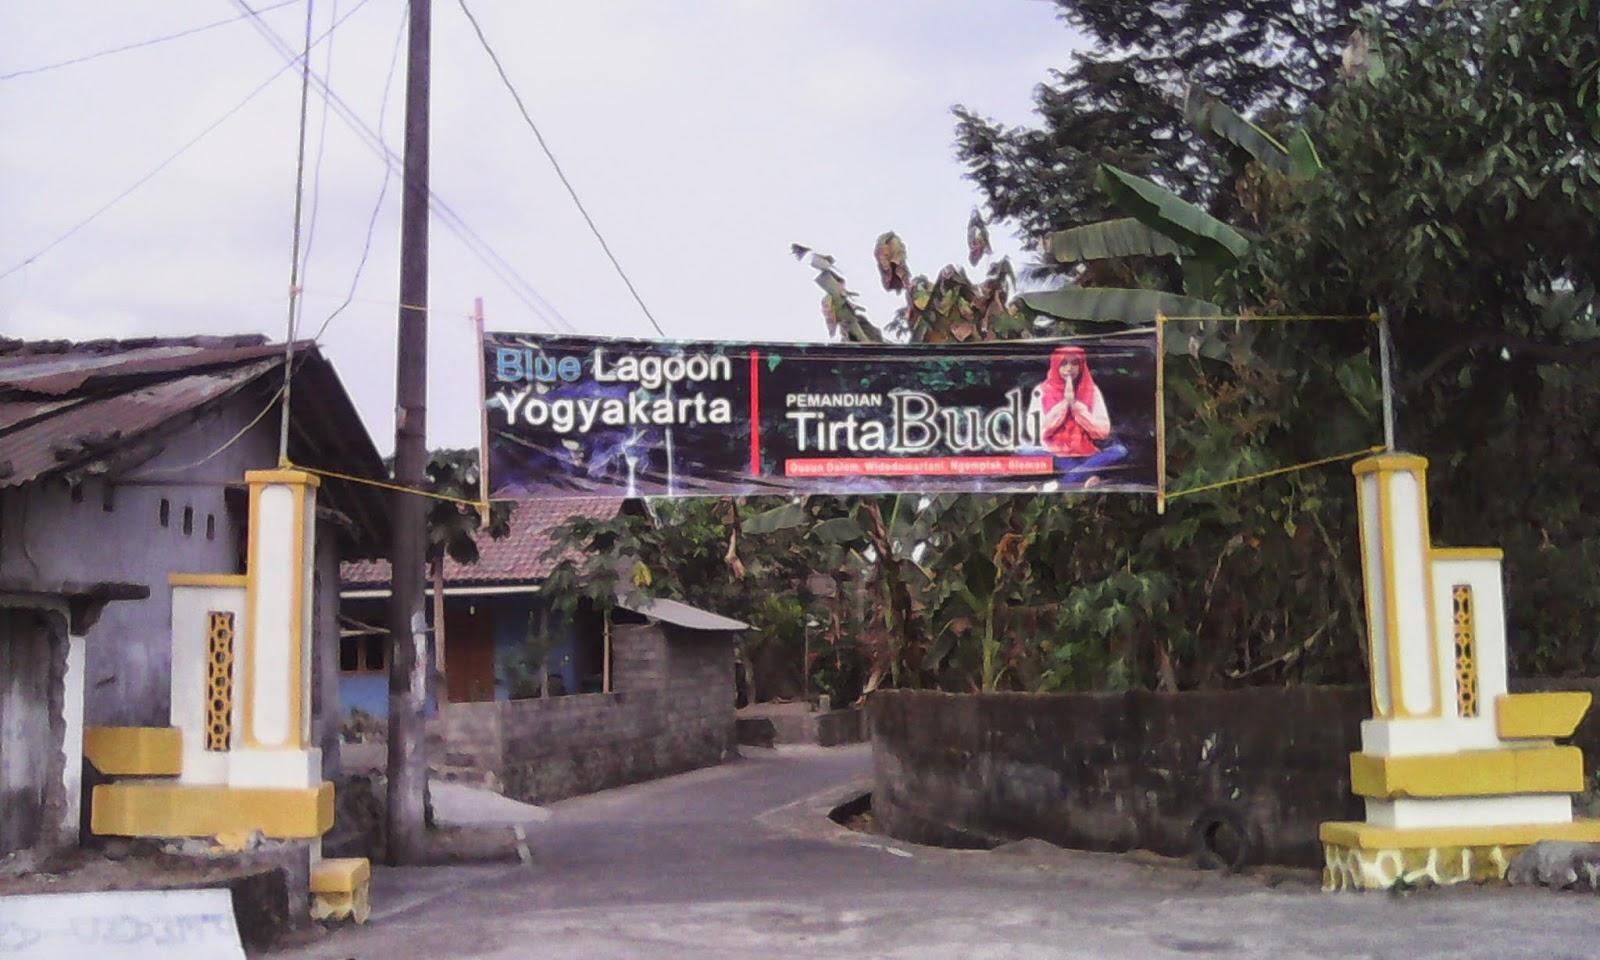 Blue Lagoon Tirta Budi Yogyakarta